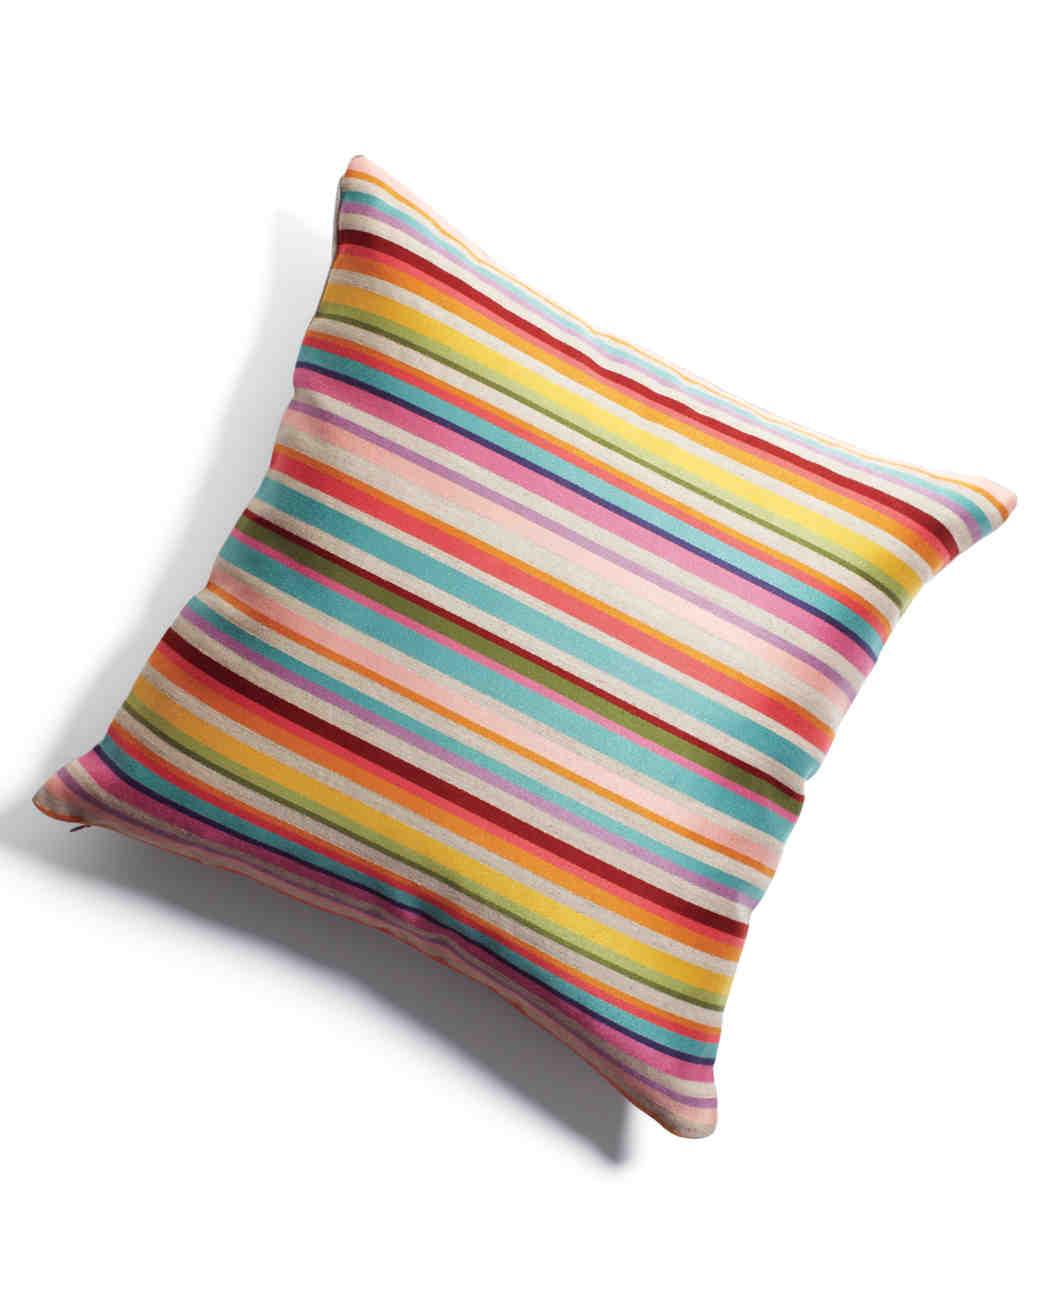 pillow-mwd108181.jpg